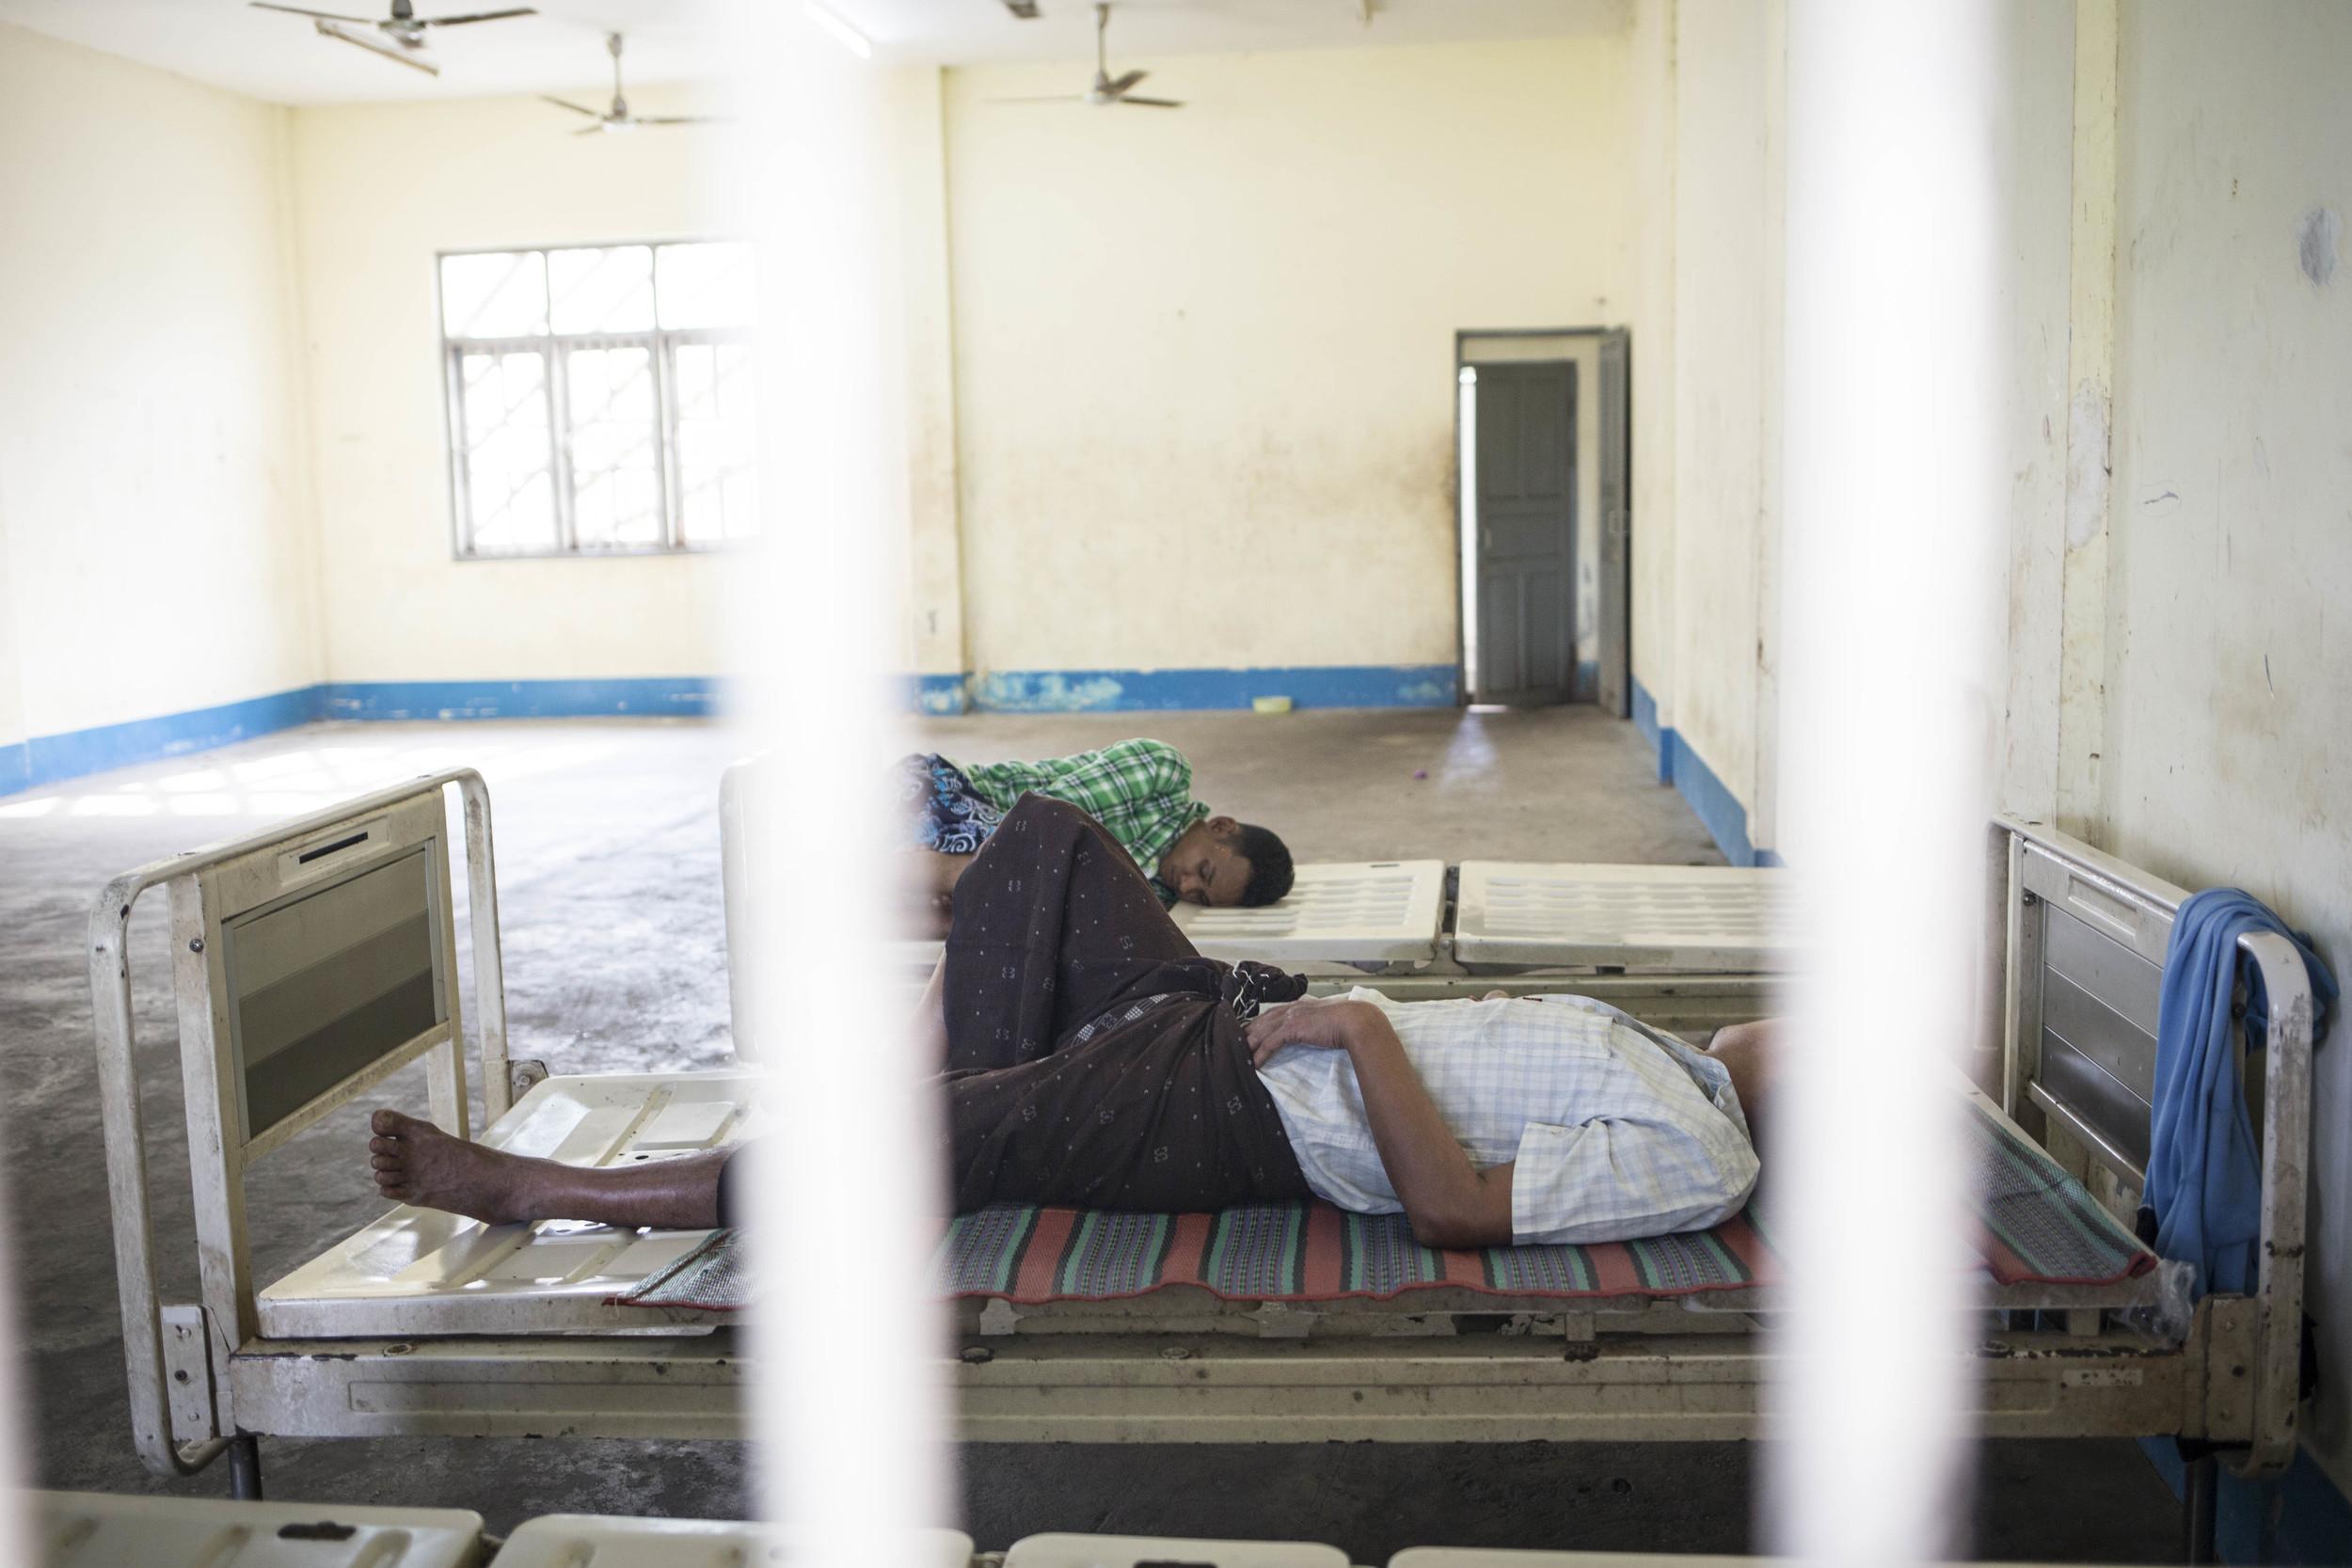 The alcoholic until at Yangon mental hospital. Photo by Ann Wang